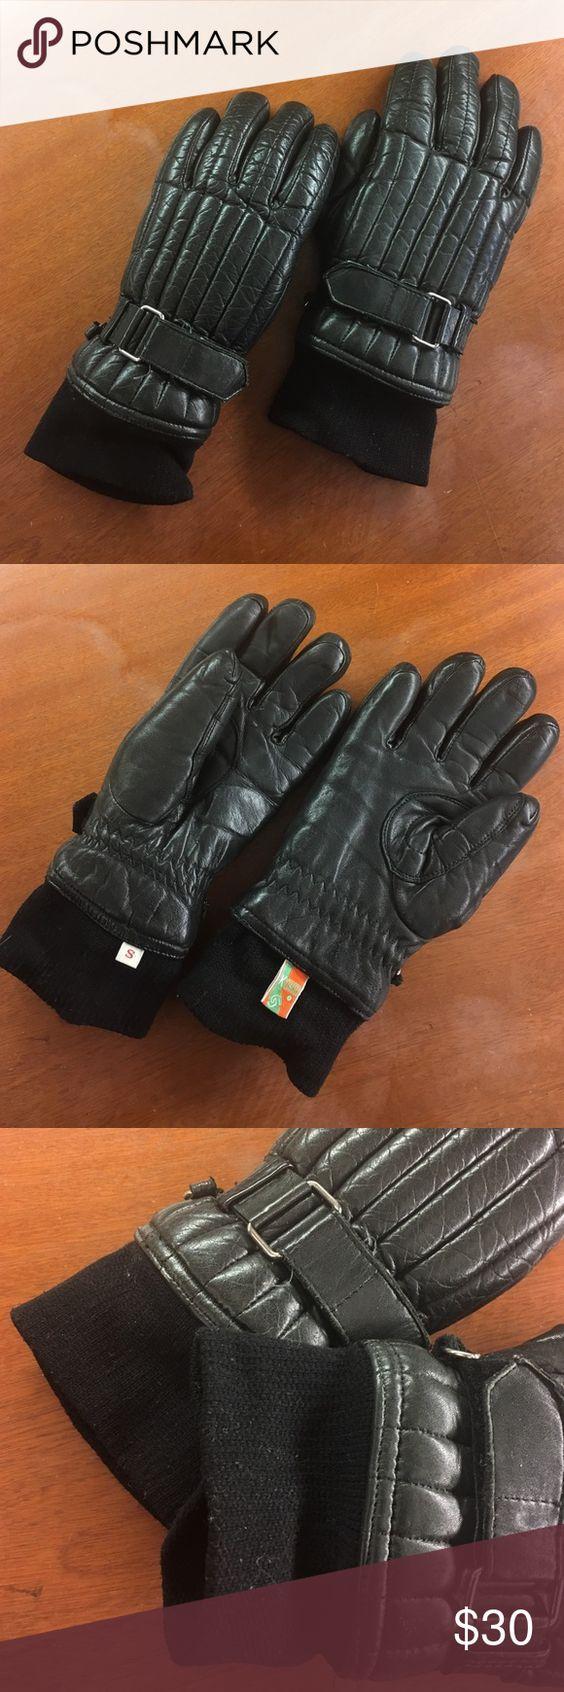 Black leather gloves small - Kombi Ski Snowboard Women S Small Leather Gloves Great Condition Small Women S Black